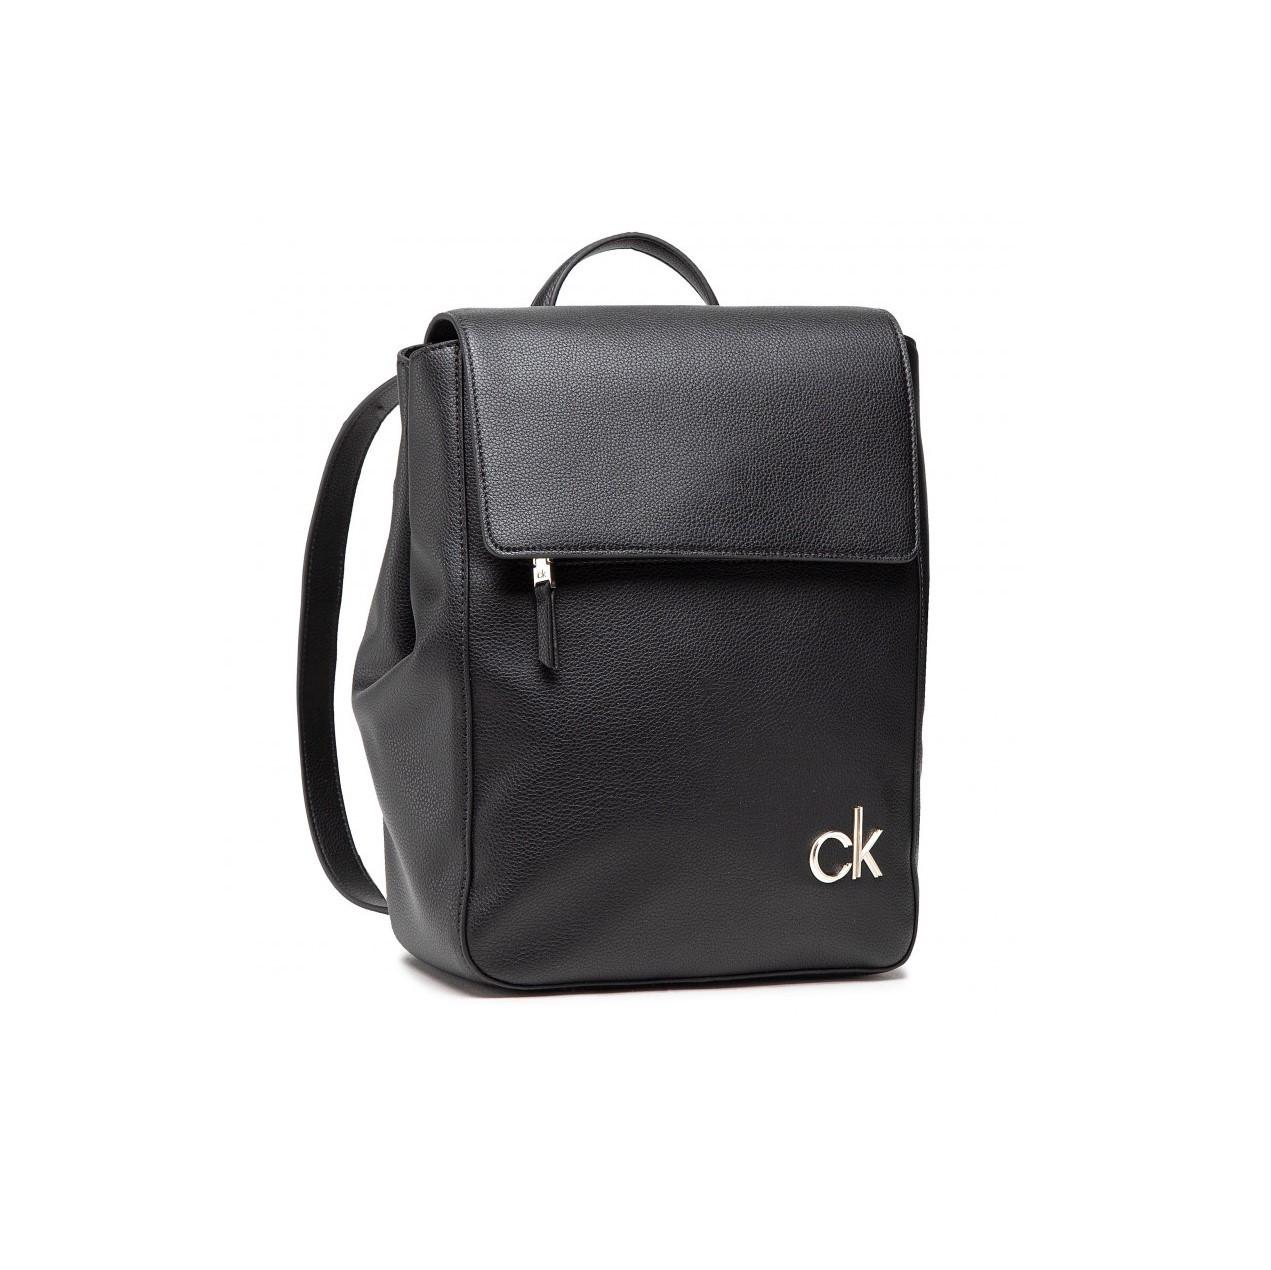 Calvin Klein dámský černý batoh FLAP BP